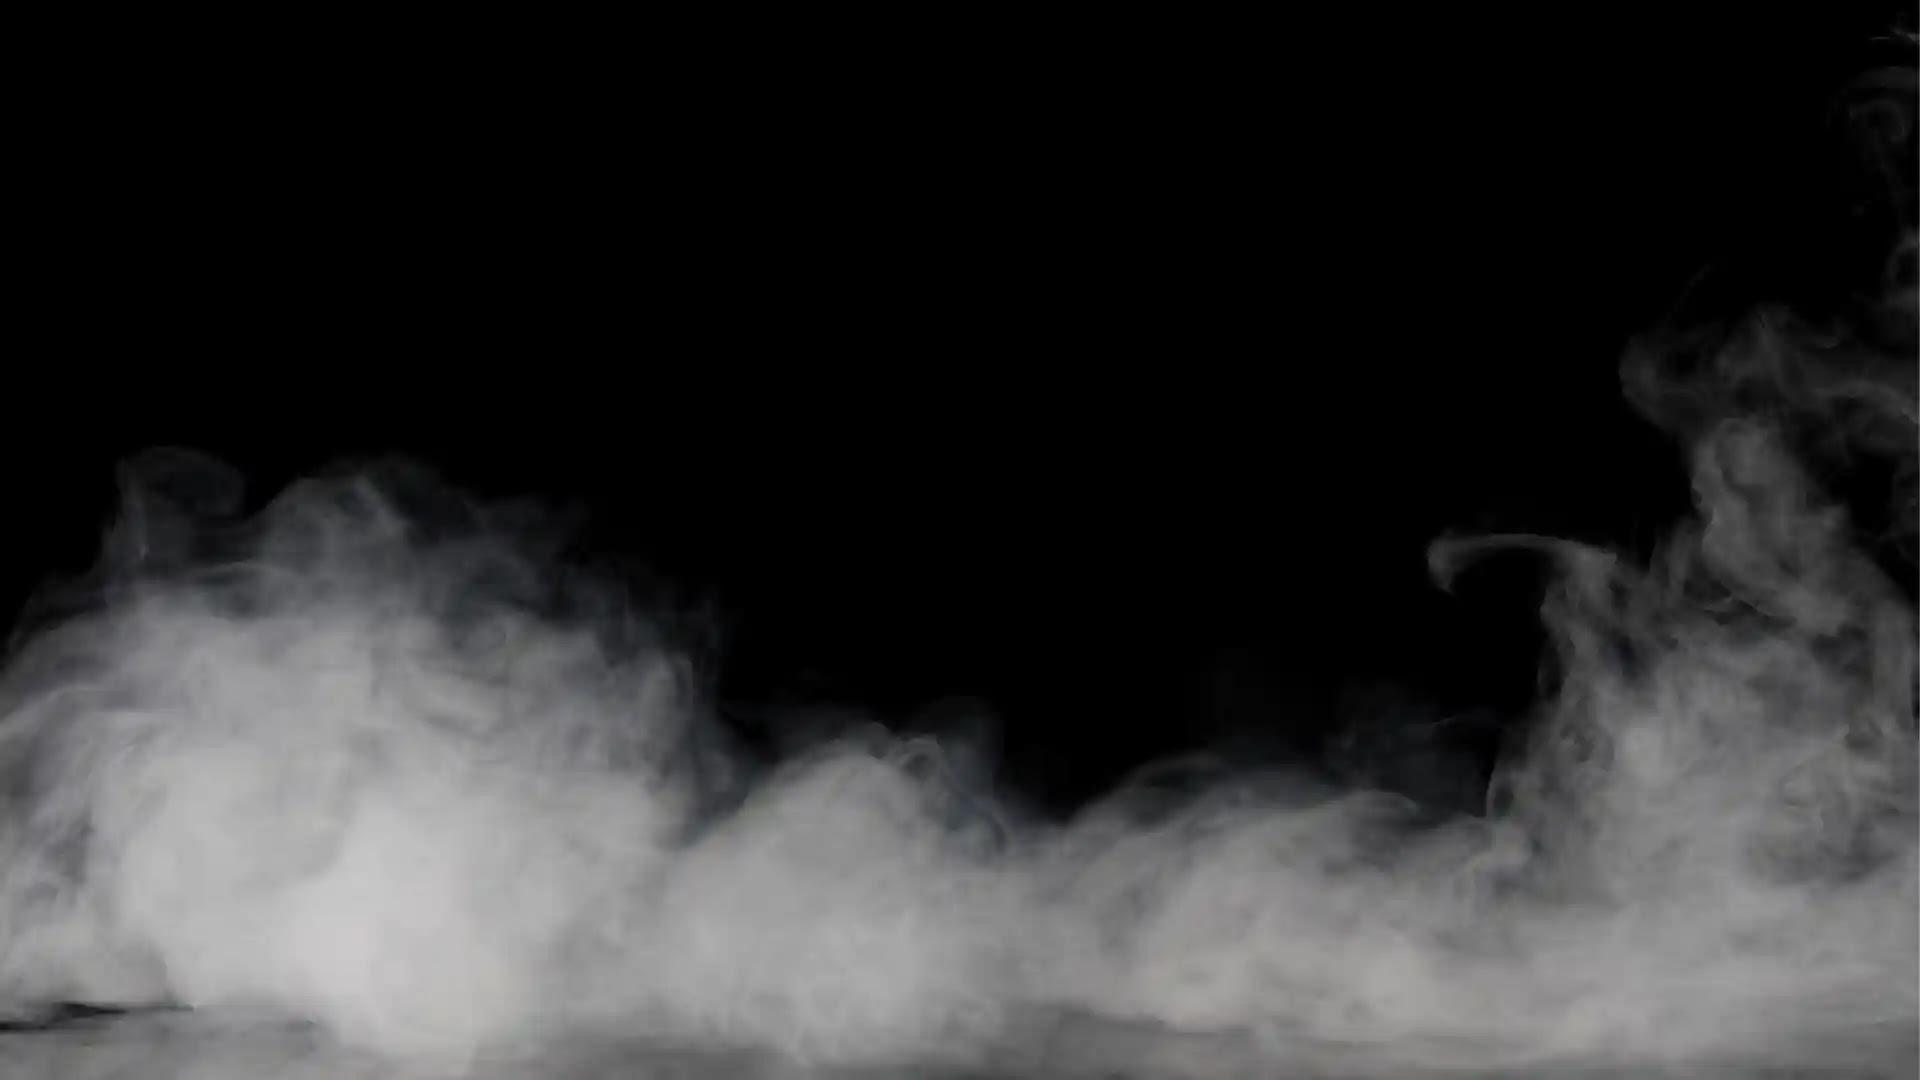 smoke black background wallpaper in 4k